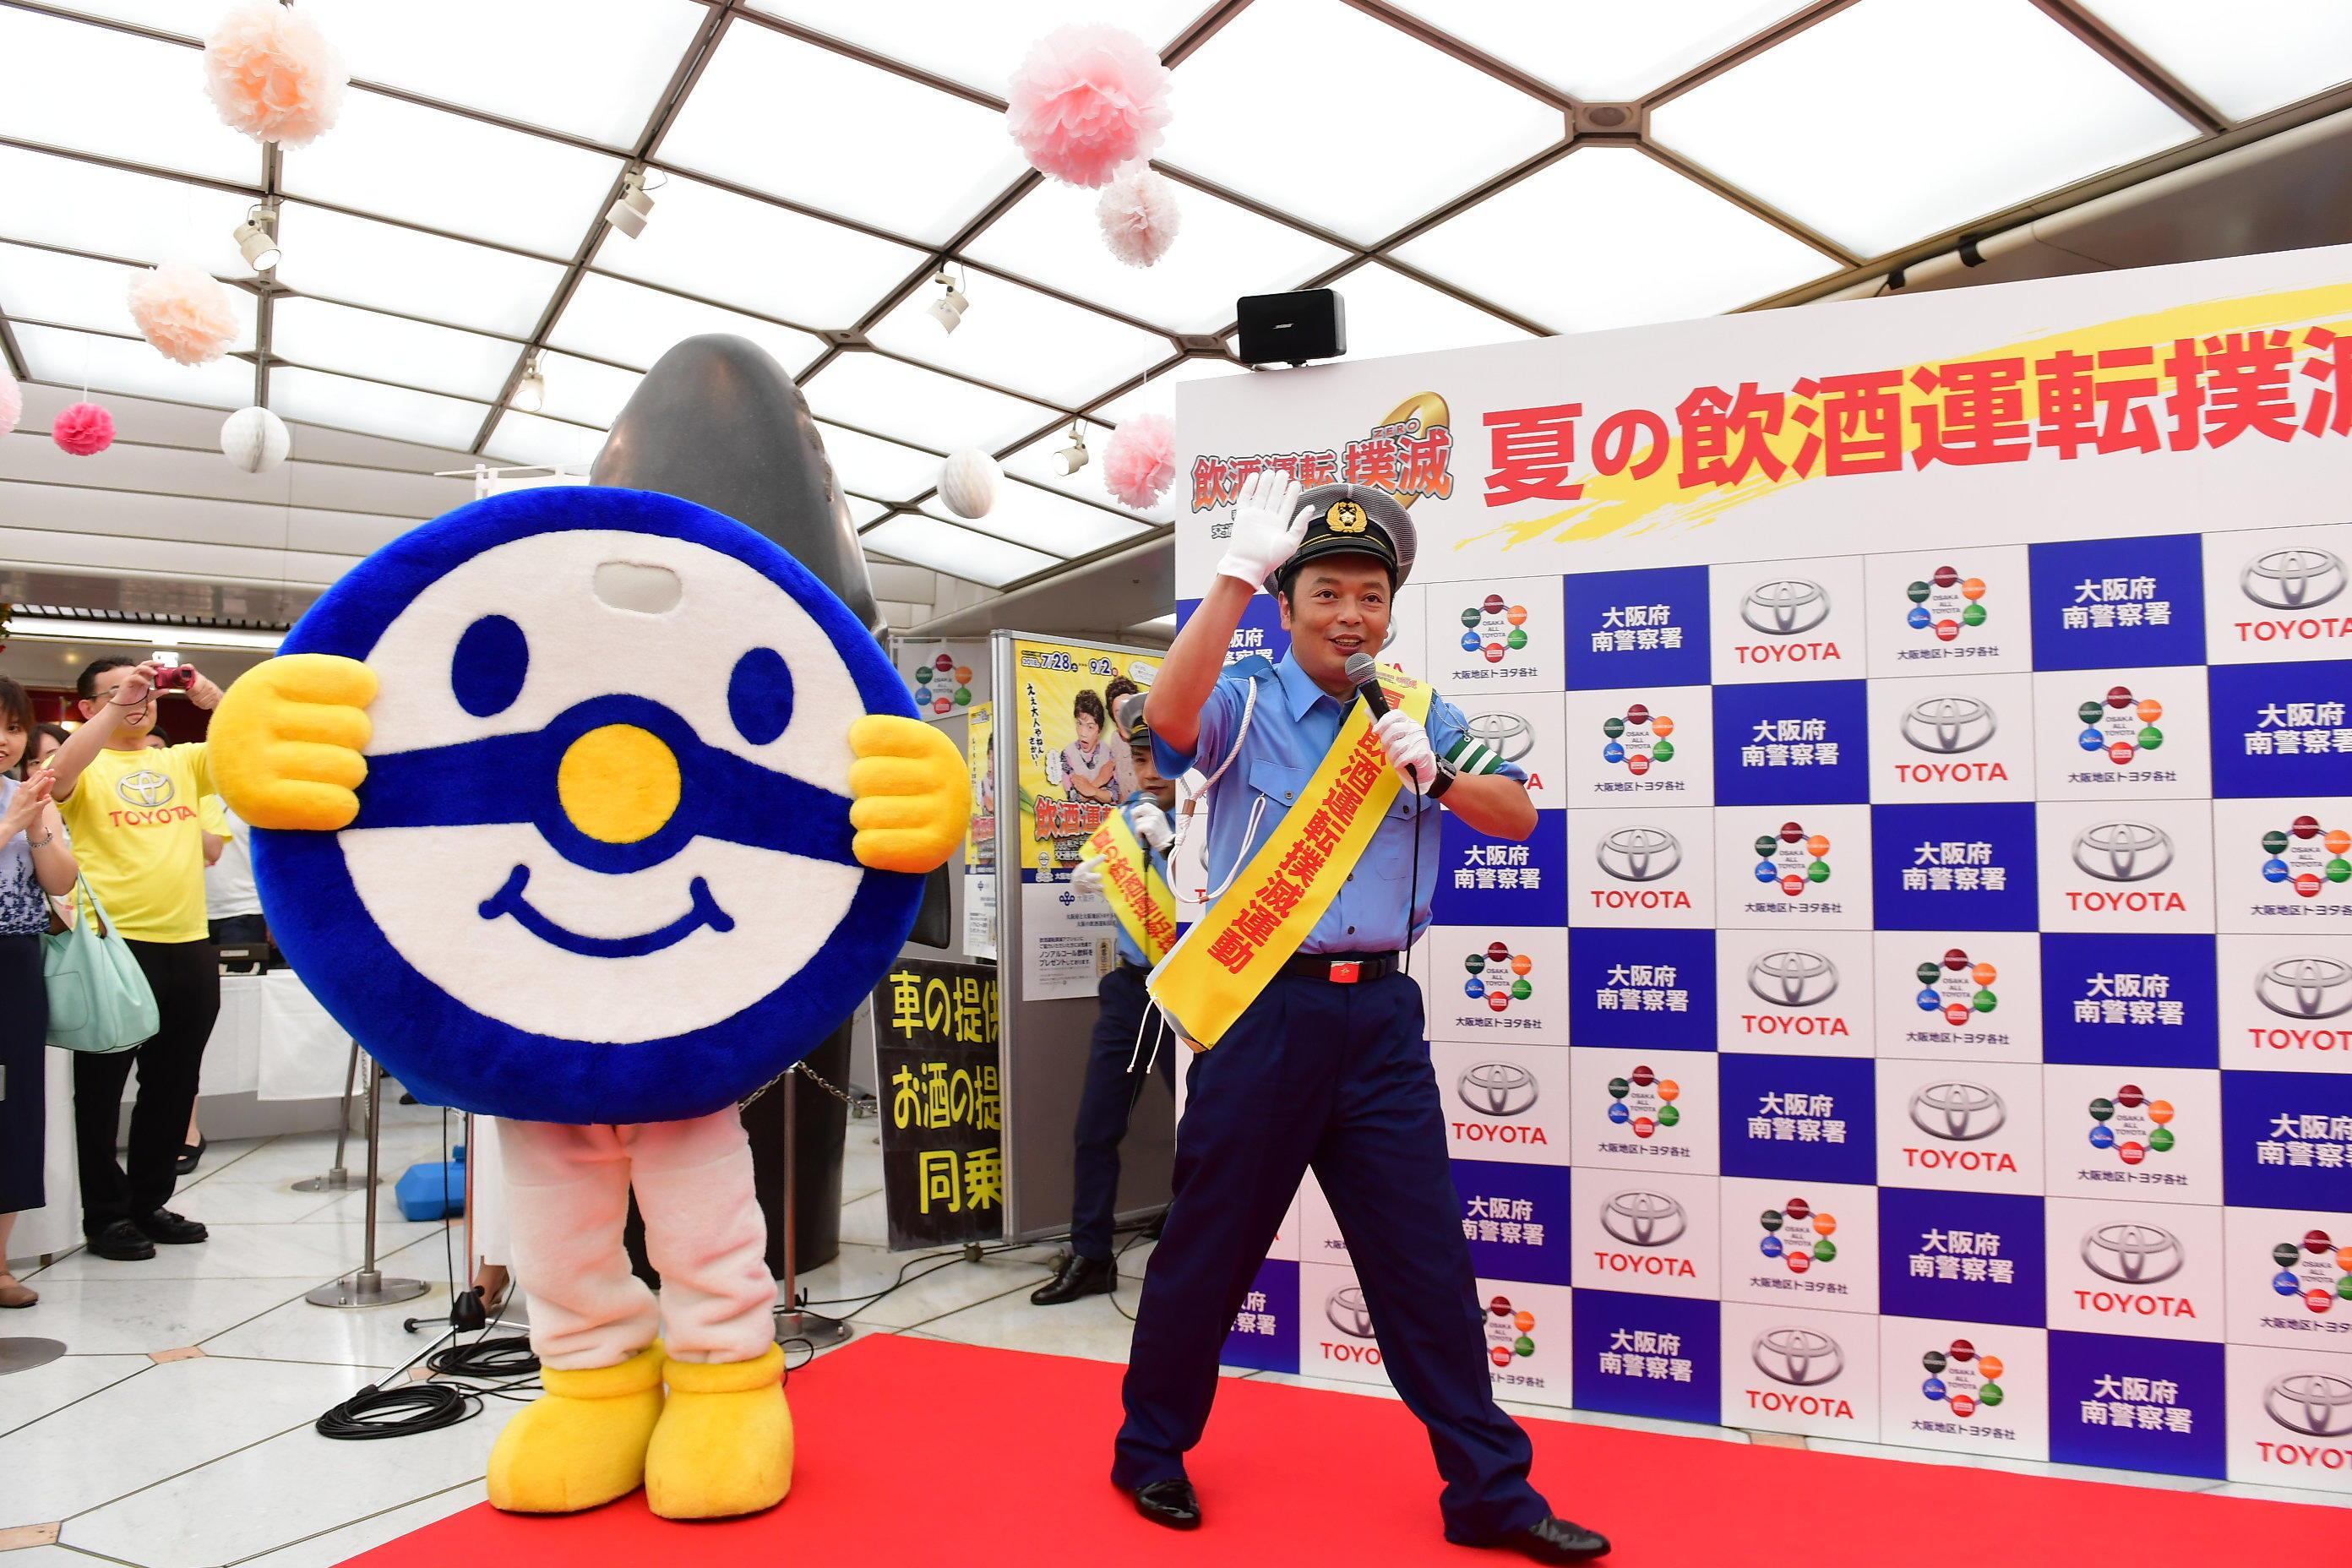 http://news.yoshimoto.co.jp/20180727201658-d4039807d0b236646acc7d1347bc7cfe8b41be7c.jpg